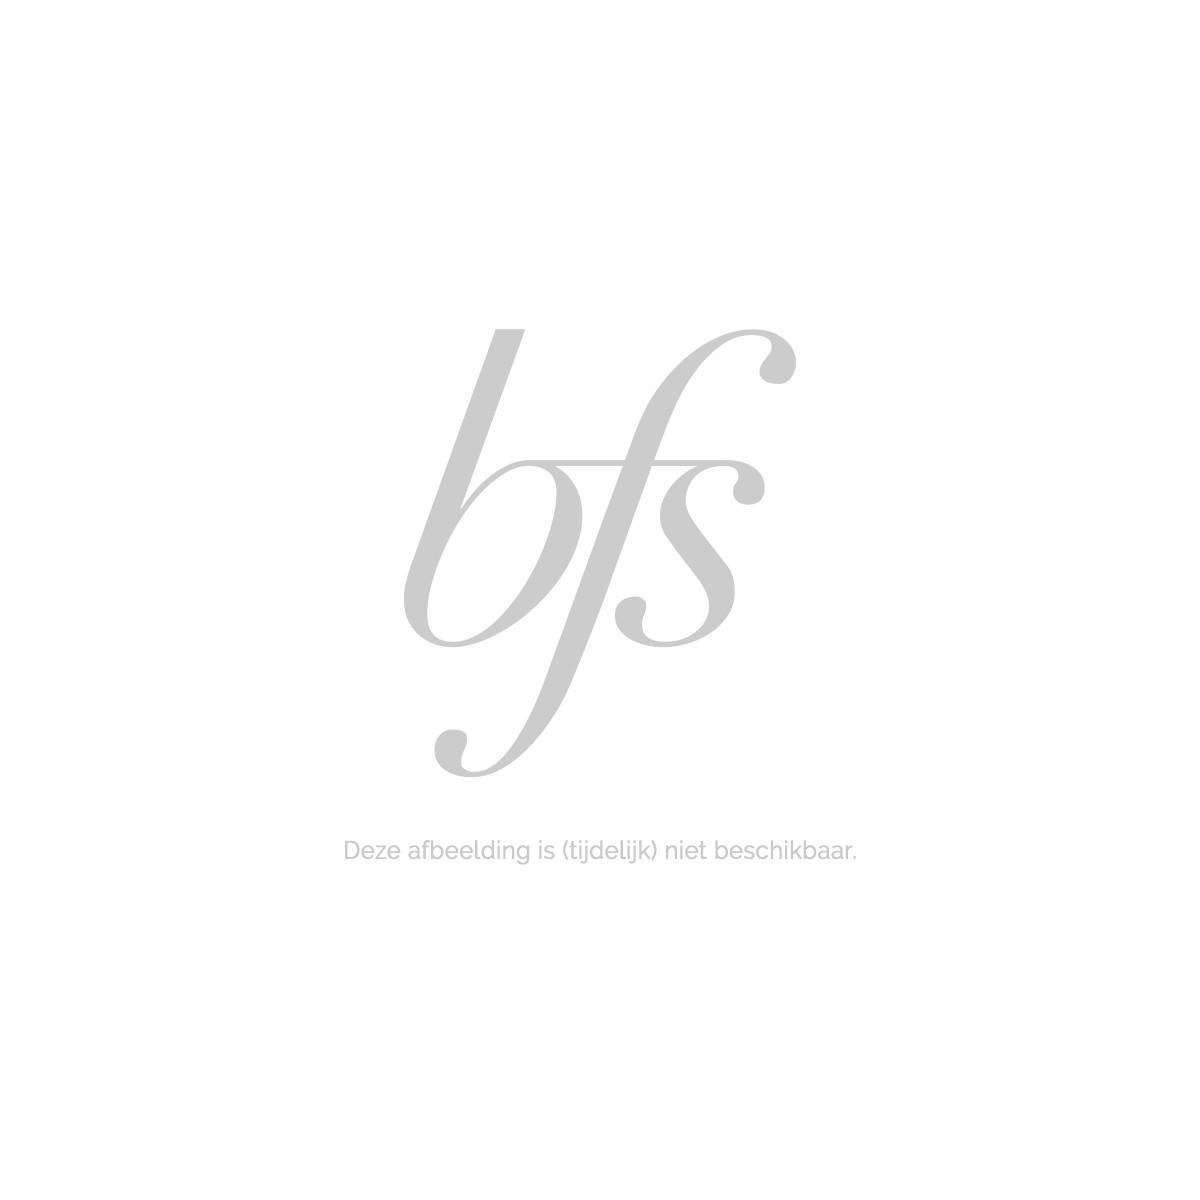 Banila Hello Sunny Essence Sun Stick Spf50+ Pa++++ Aqua